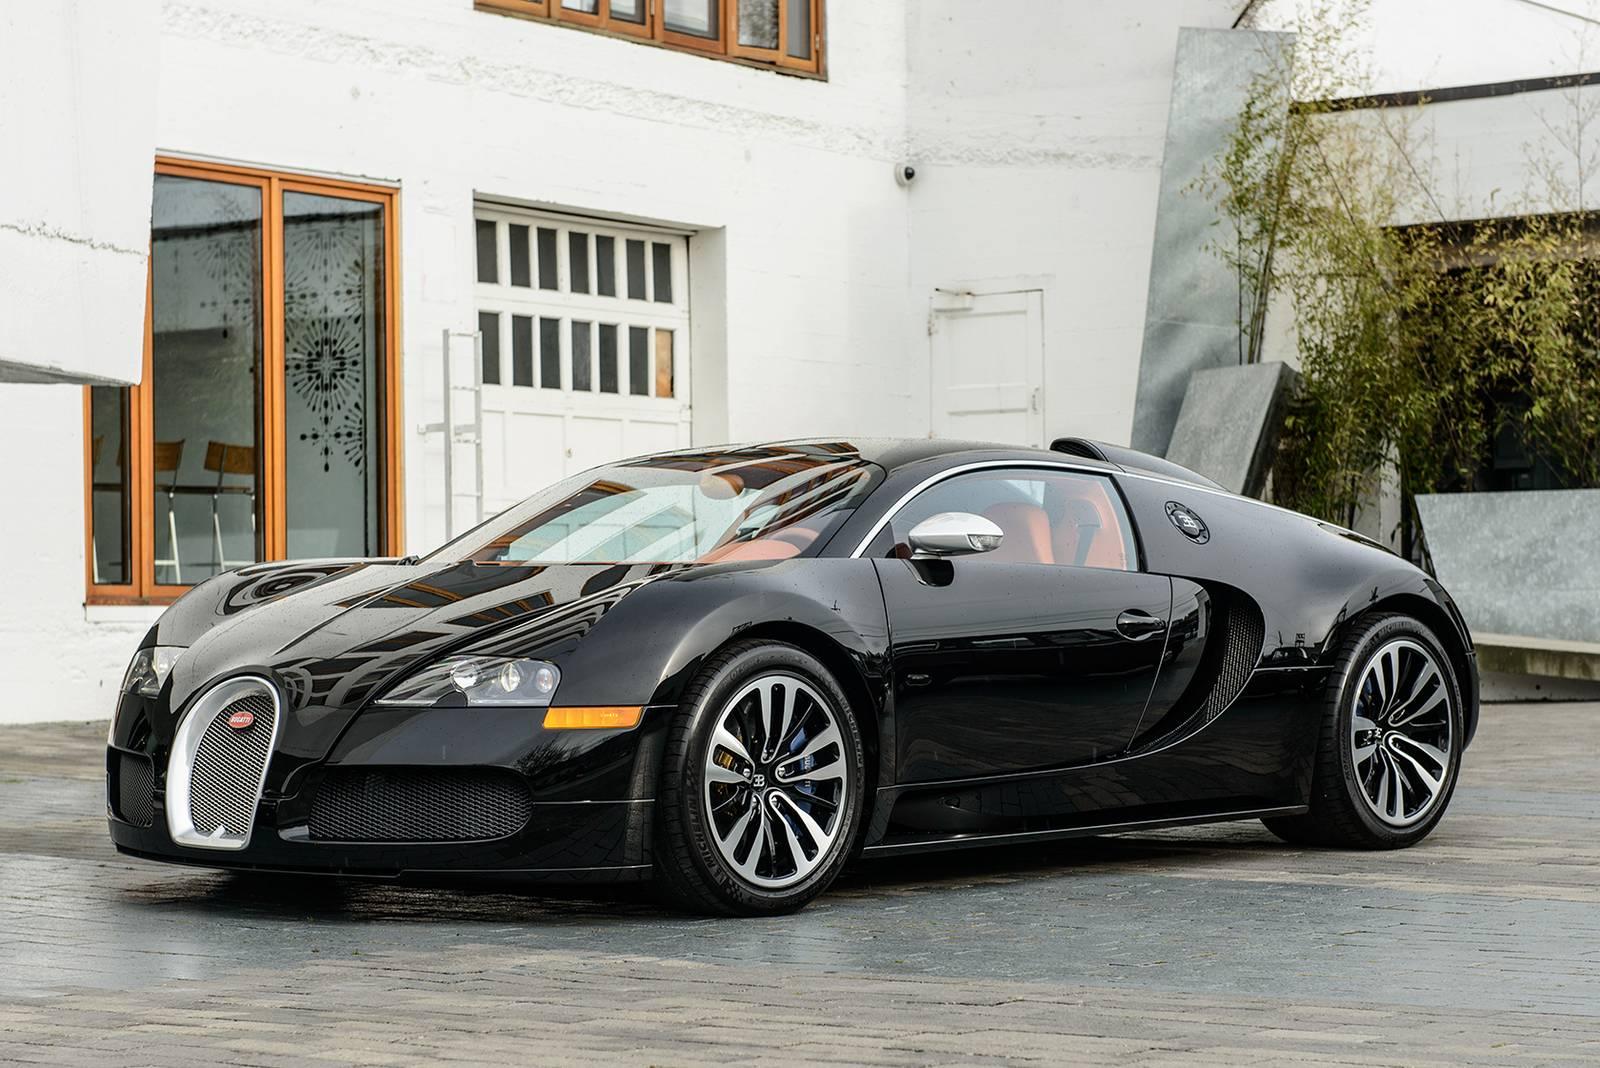 Drake's Bugatti Veyron Sang Noir Hits the Used Car Market - GTspirit